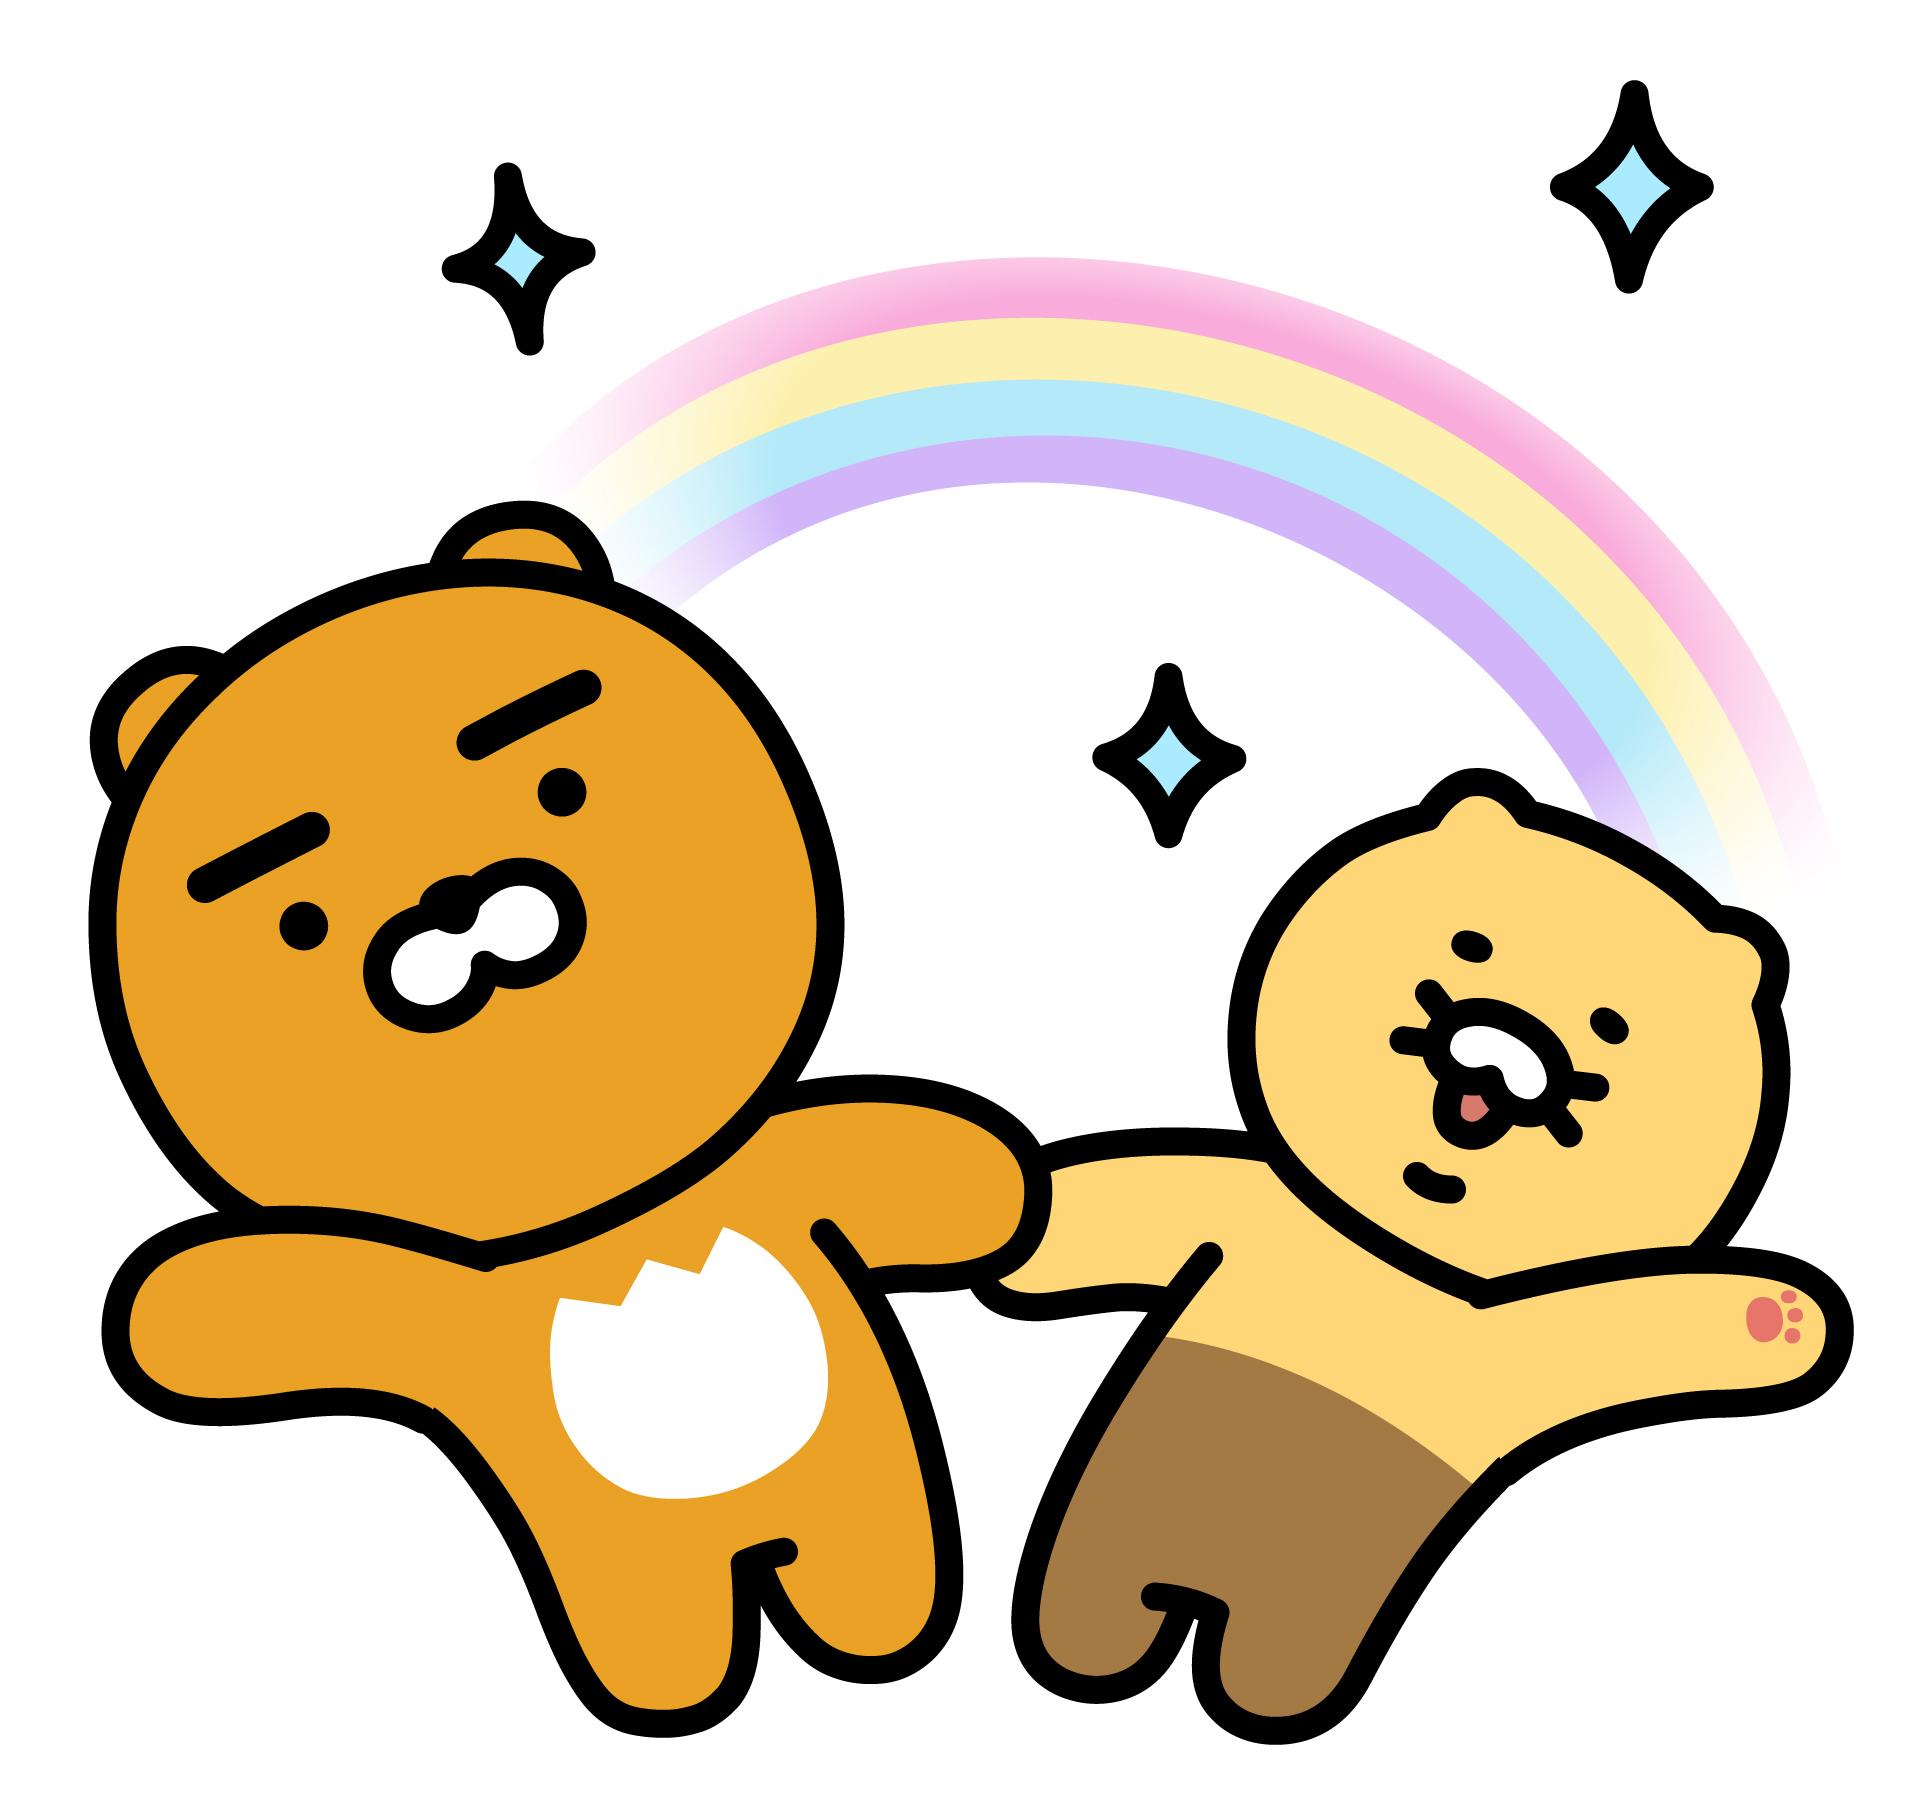 3-3_ryan_and_choonsik_holding_hands_under_the_rainbow.jpg